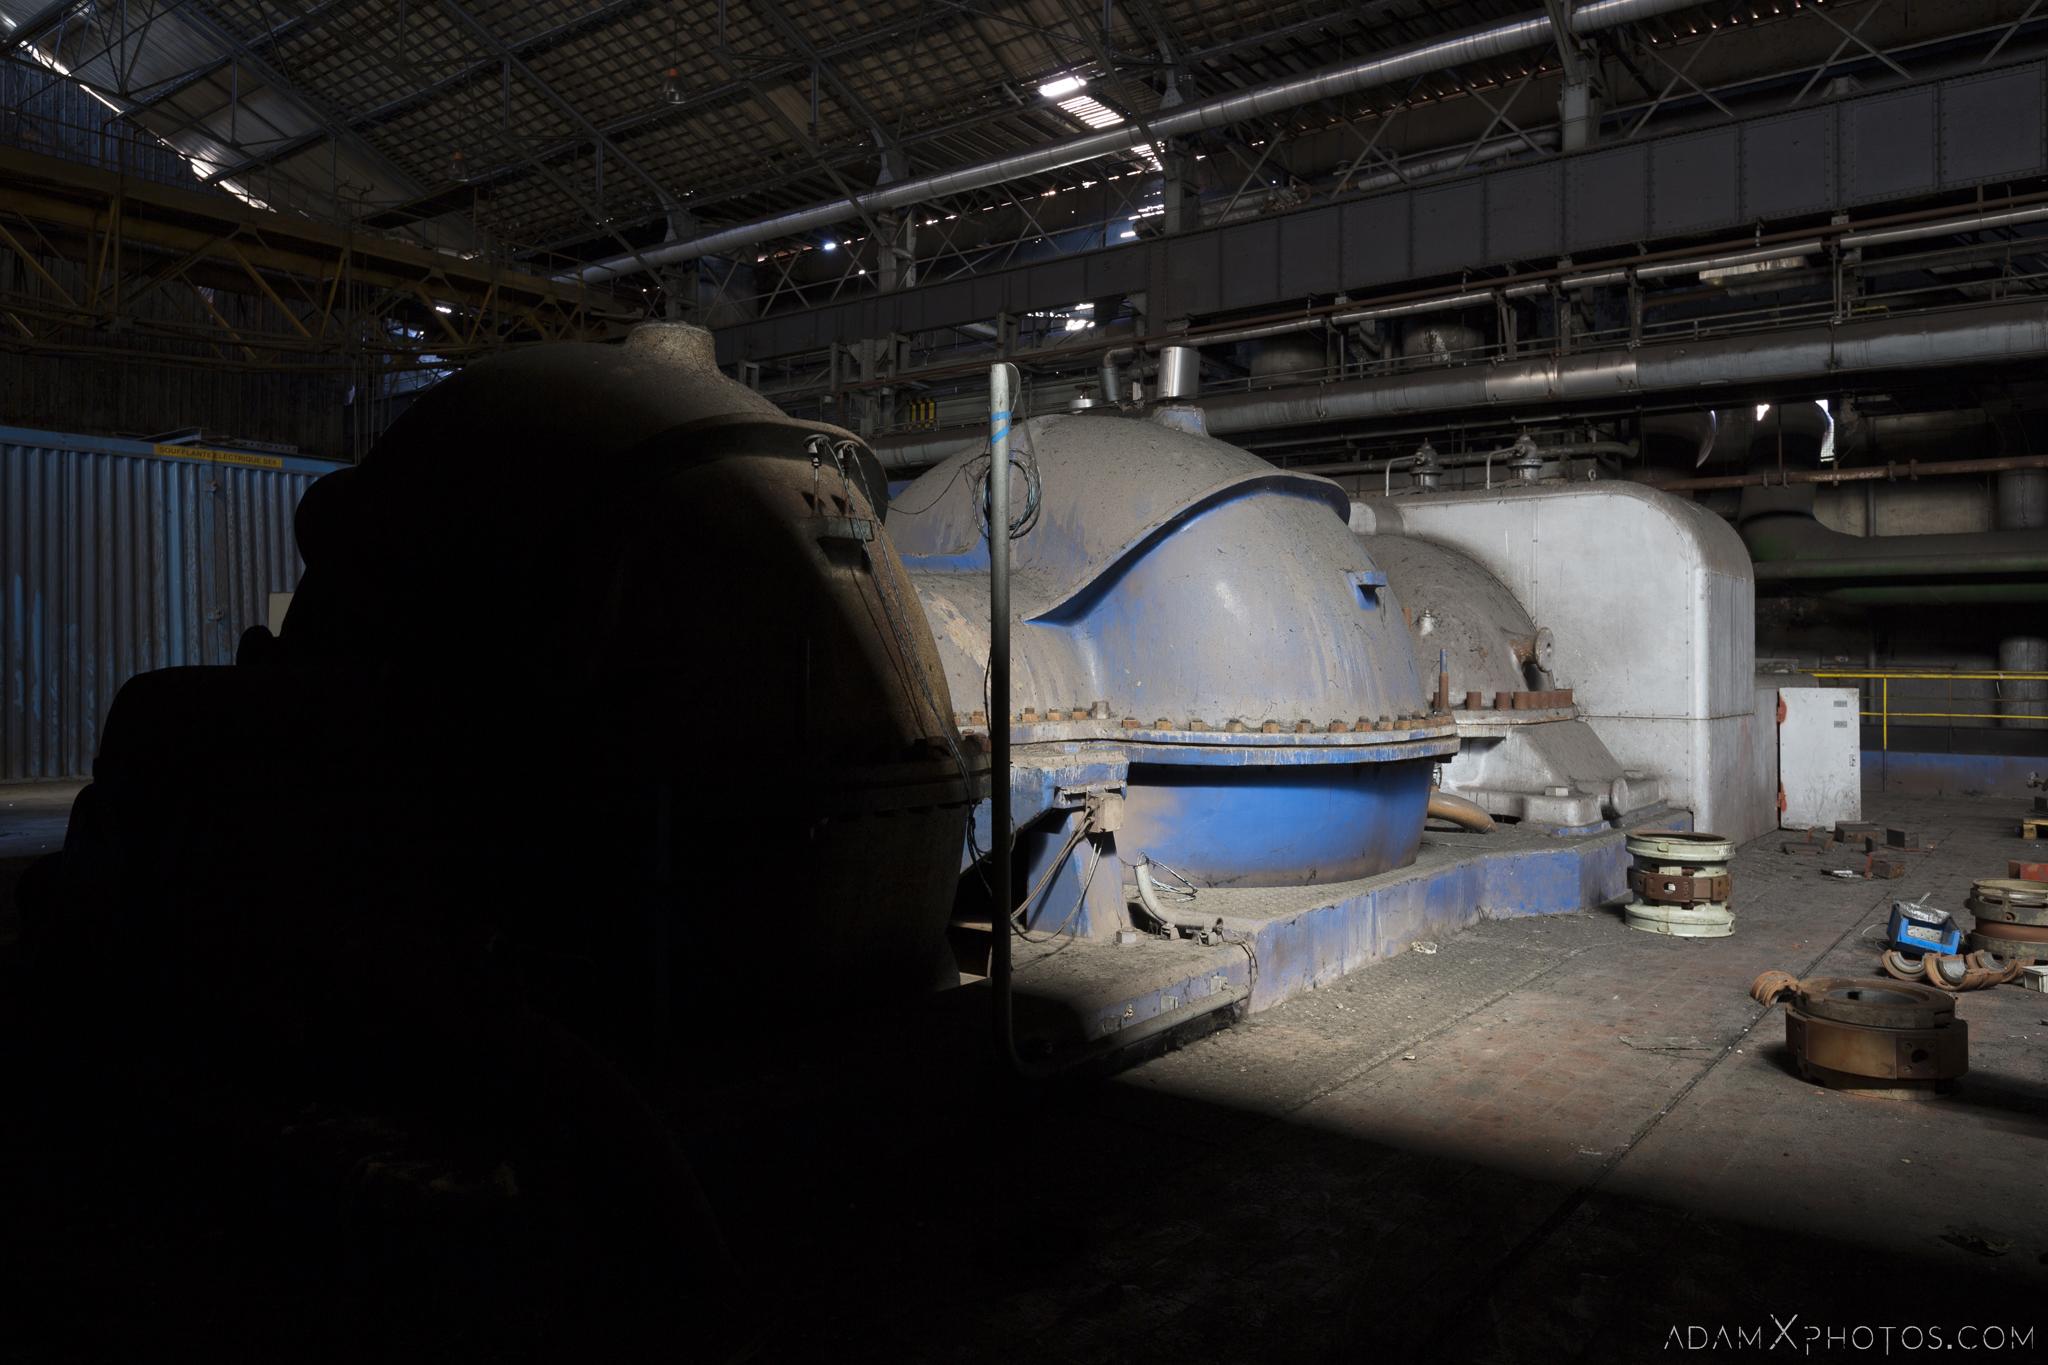 Blue turbine Haut Fourneau B HFB Blast Furnace Steelworks Adam X Urban Exploration Belgium Access 2017 Abandoned decay lost forgotten derelict location creepy haunting eerie